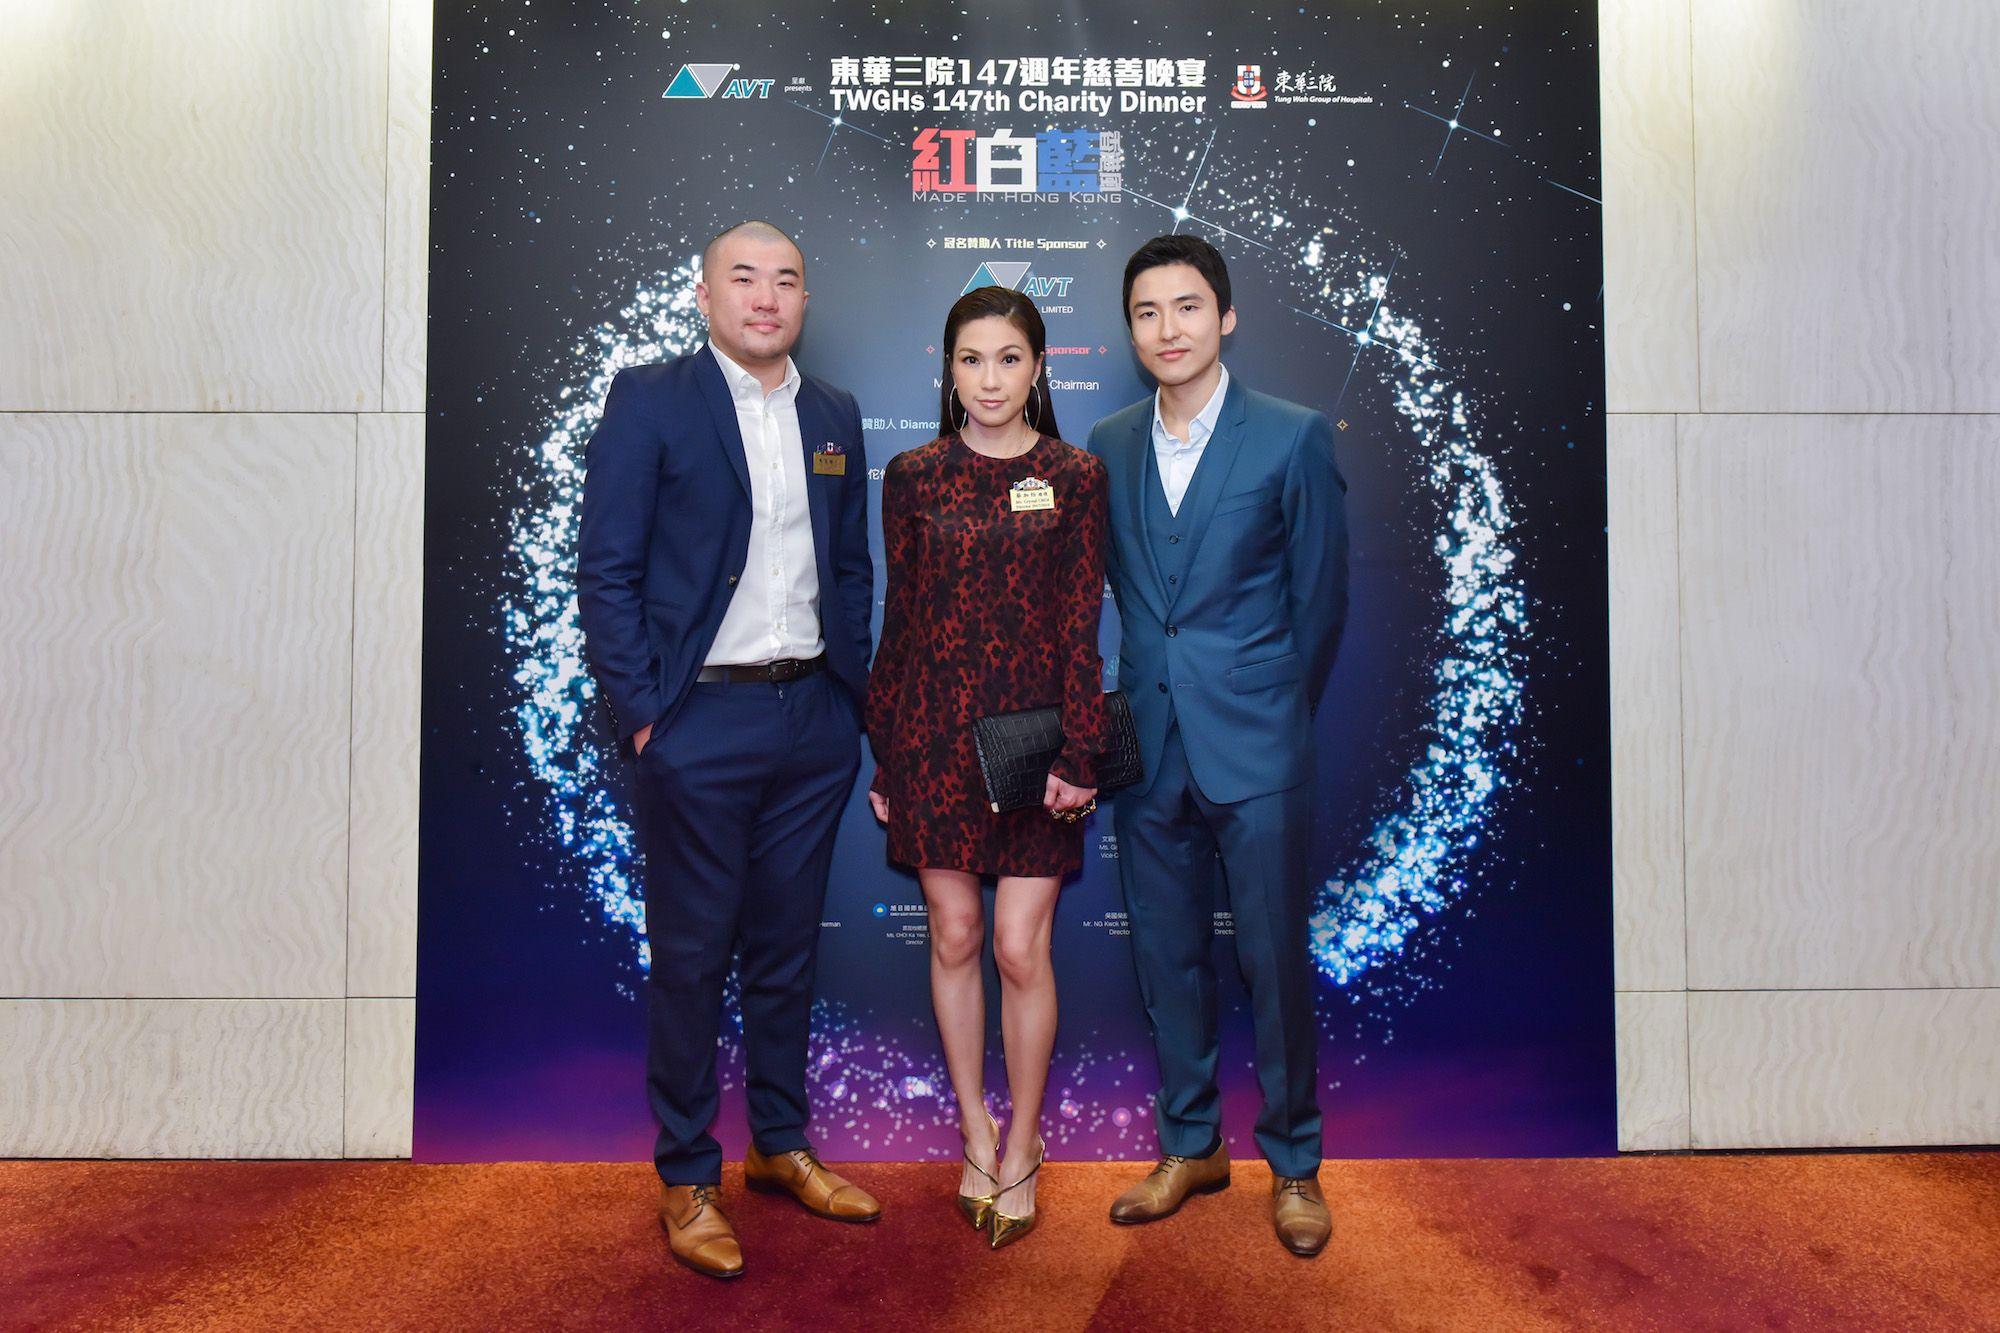 Jeremy Chan, Crystal Choi, Karson Choi